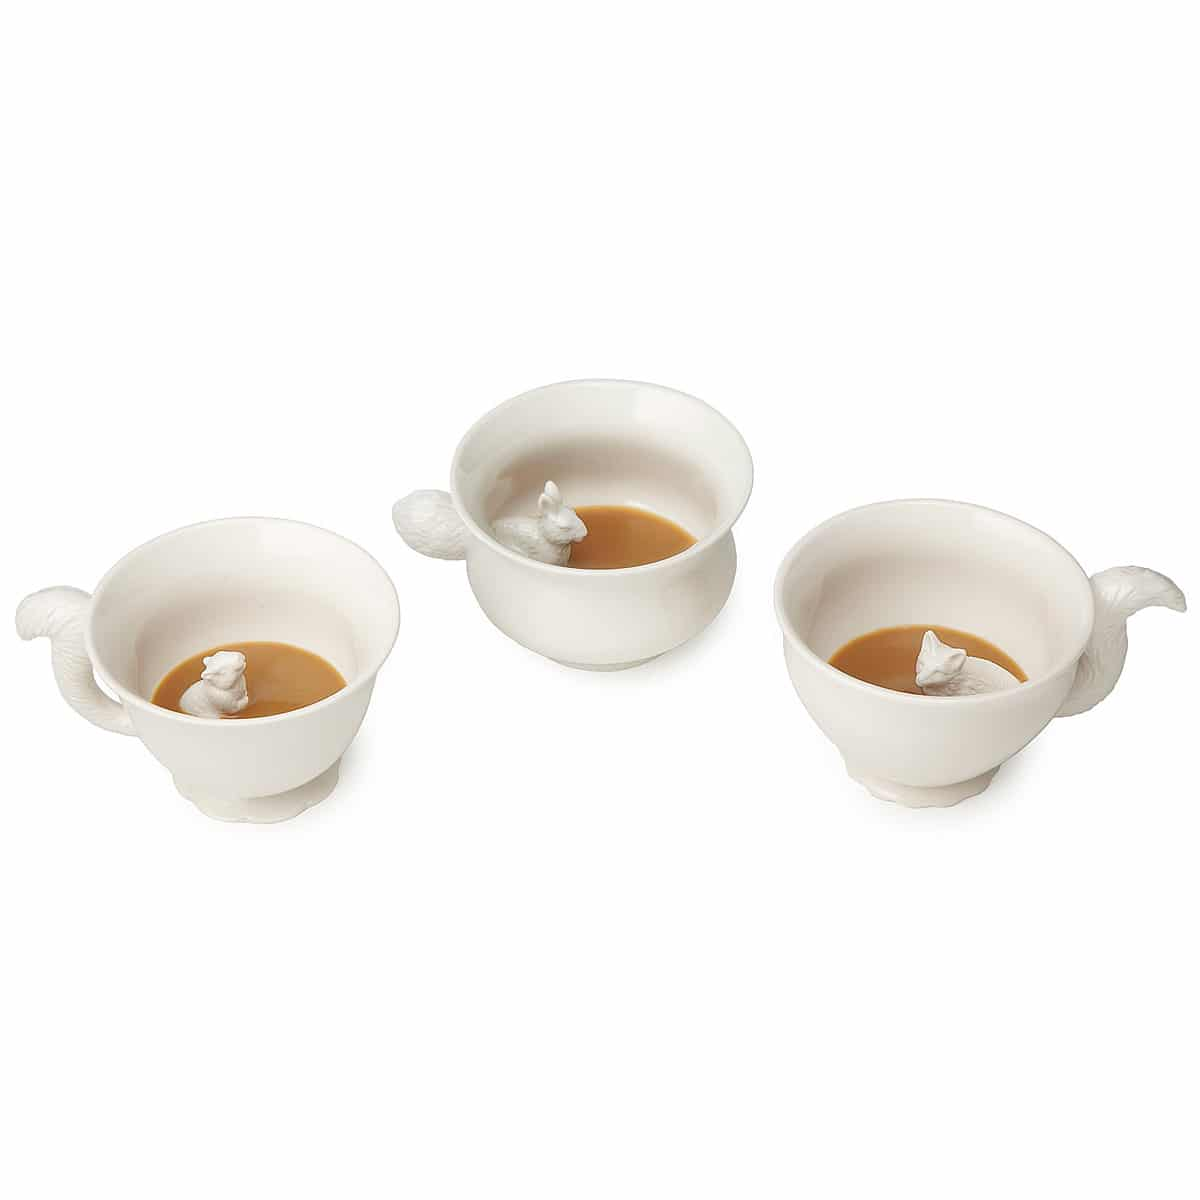 hidden-animal-mugs